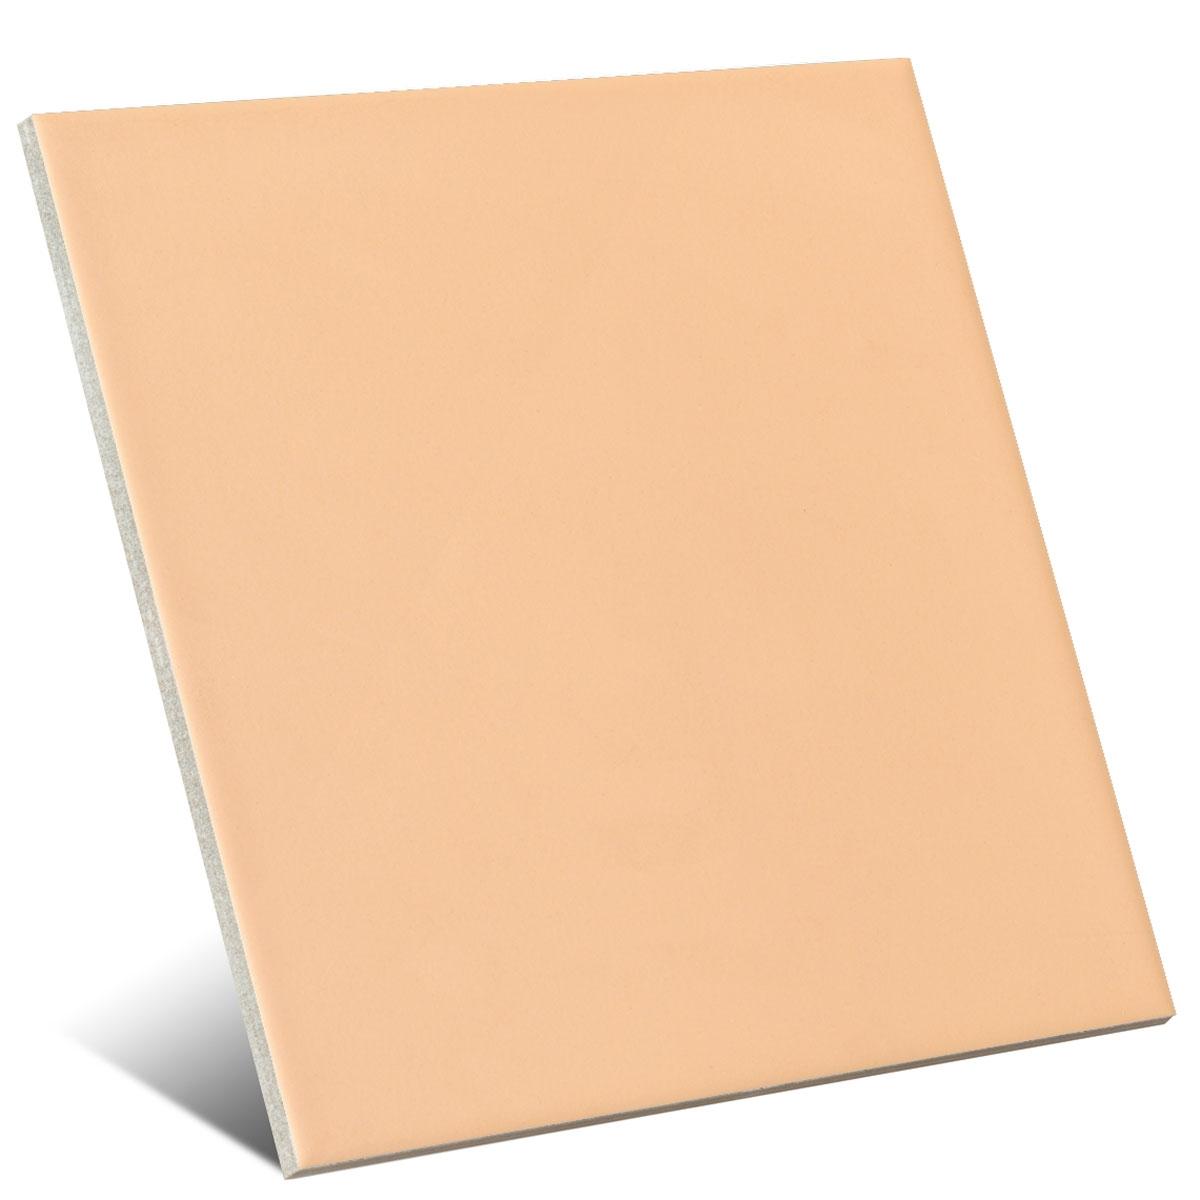 Color beige oscuro mate 20x20 cm (caja 1 m2)